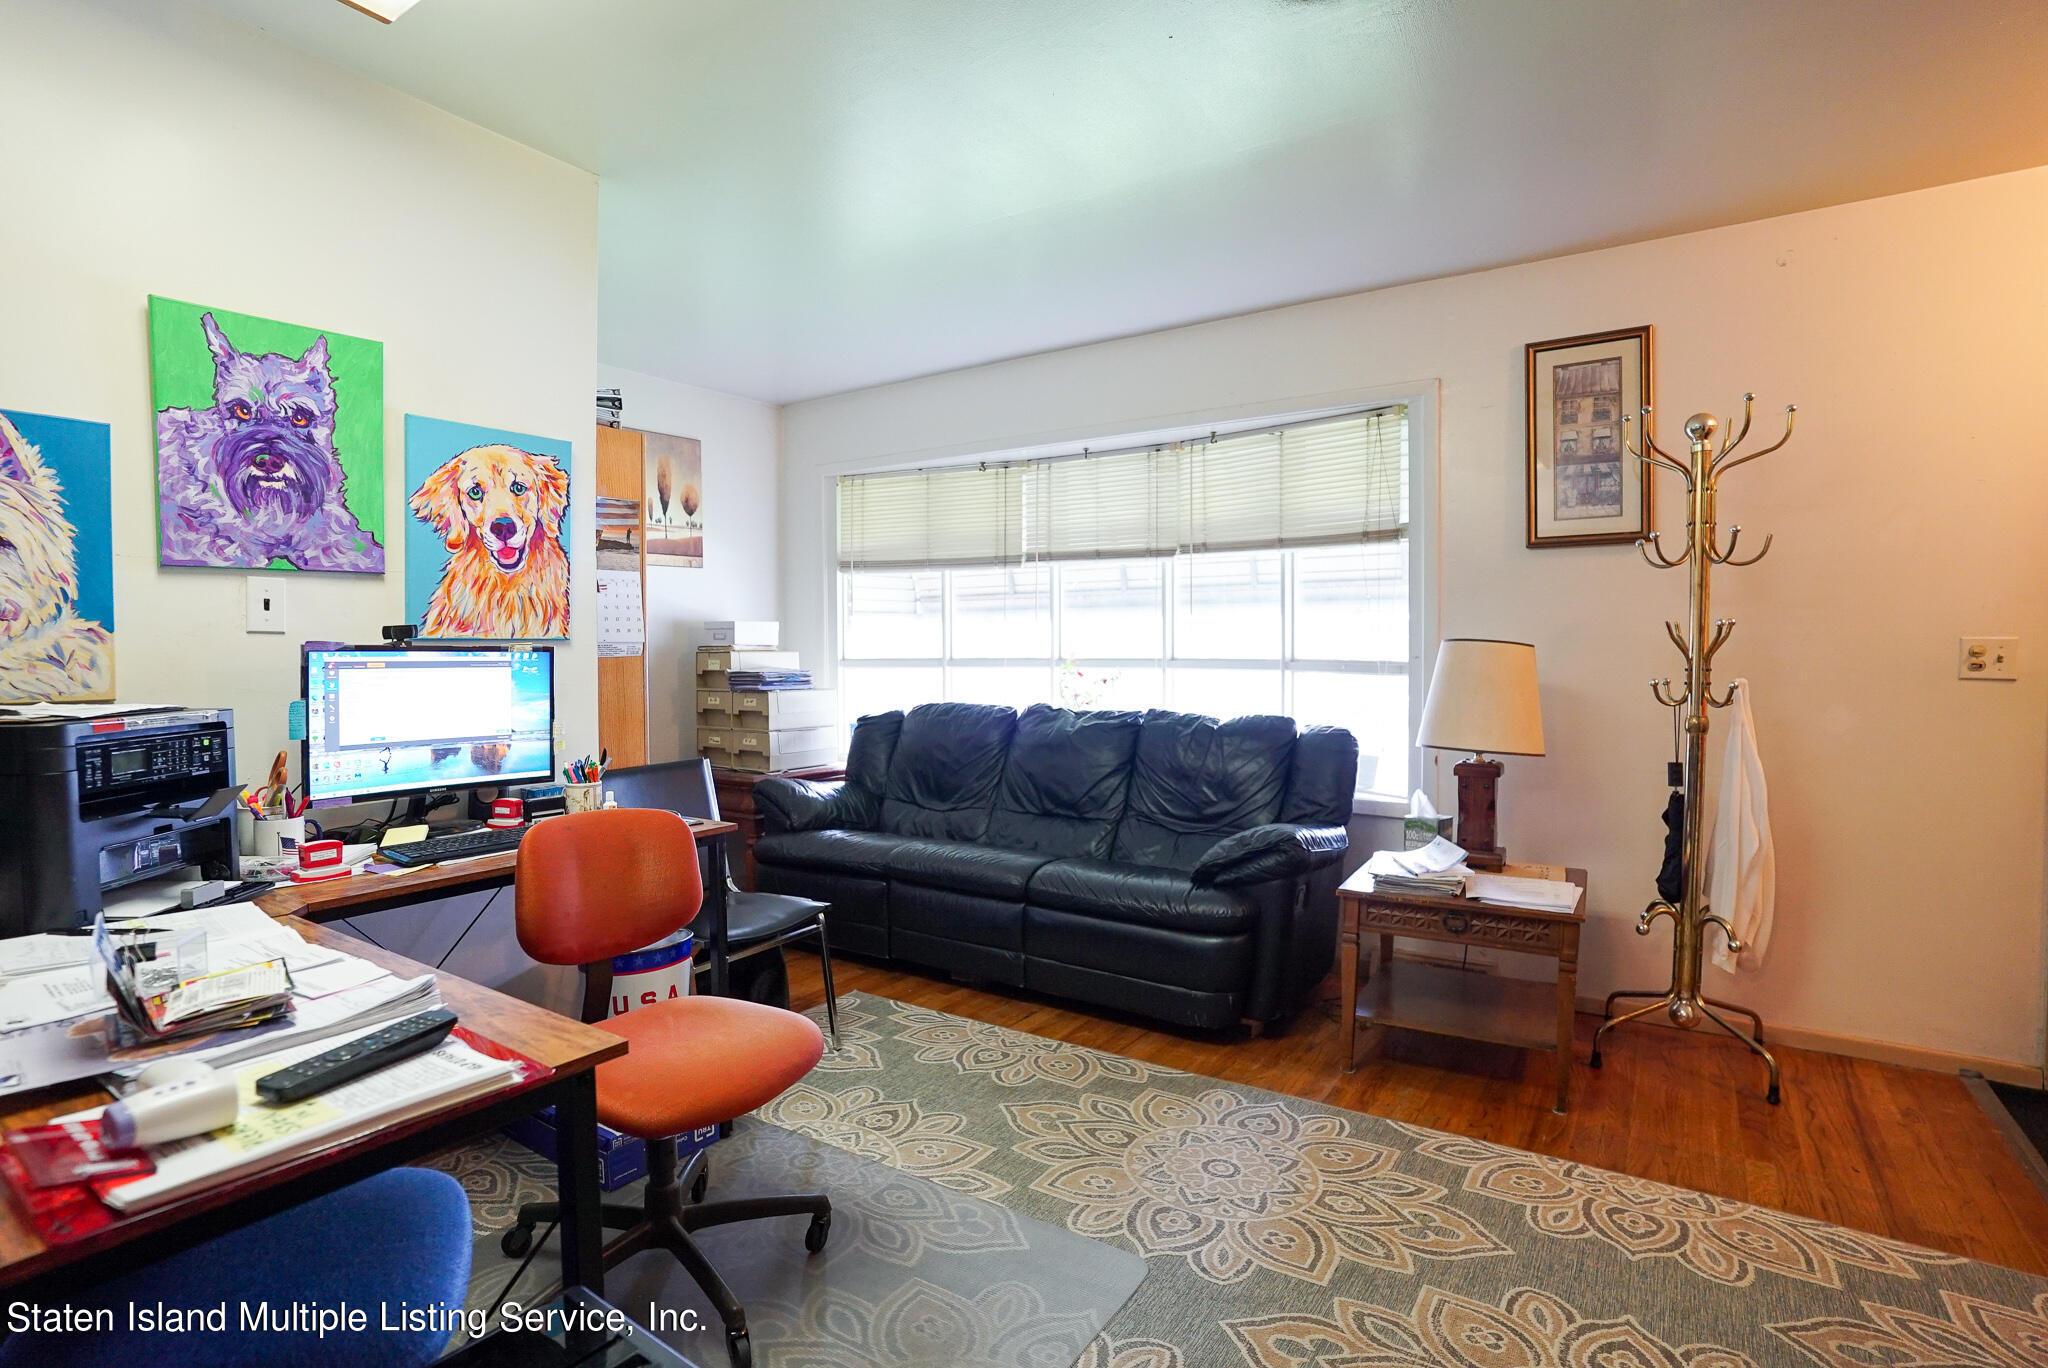 Single Family - Detached 121 Parkinson Avenue  Staten Island, NY 10305, MLS-1147747-7